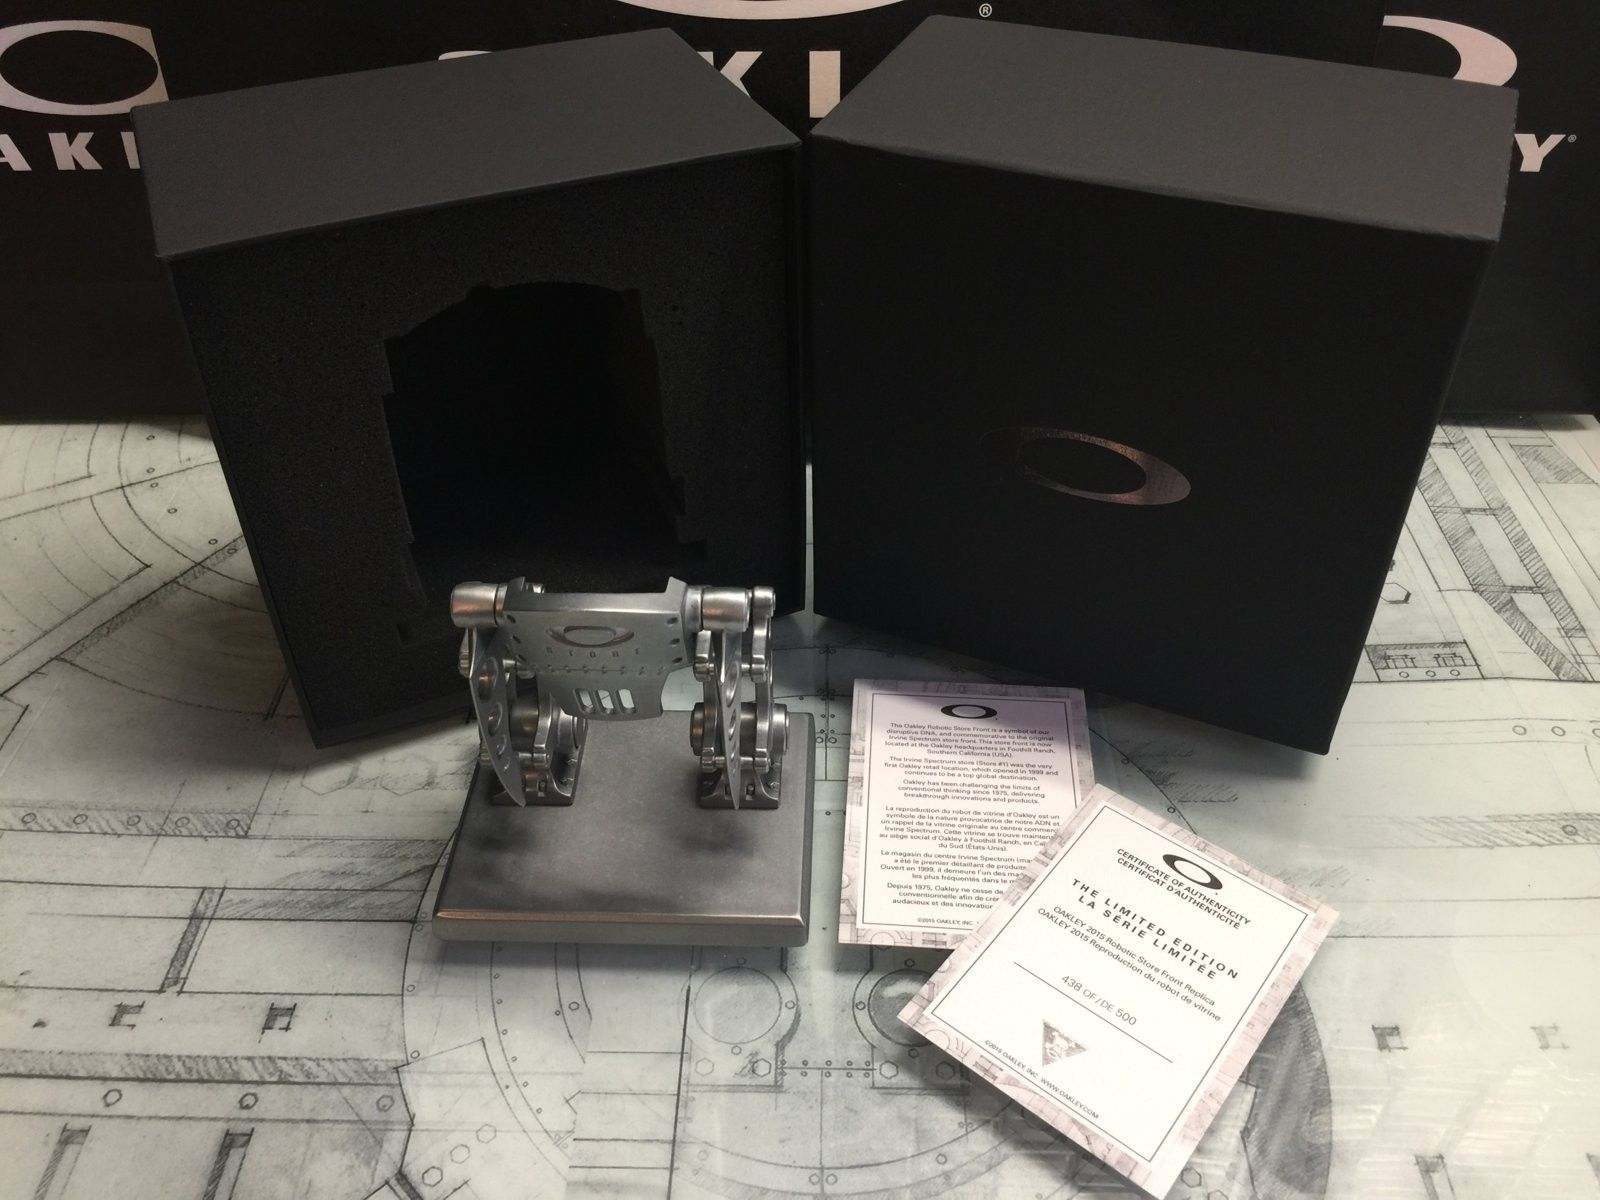 Robotic Storefront #438 - IMG_2091.JPG